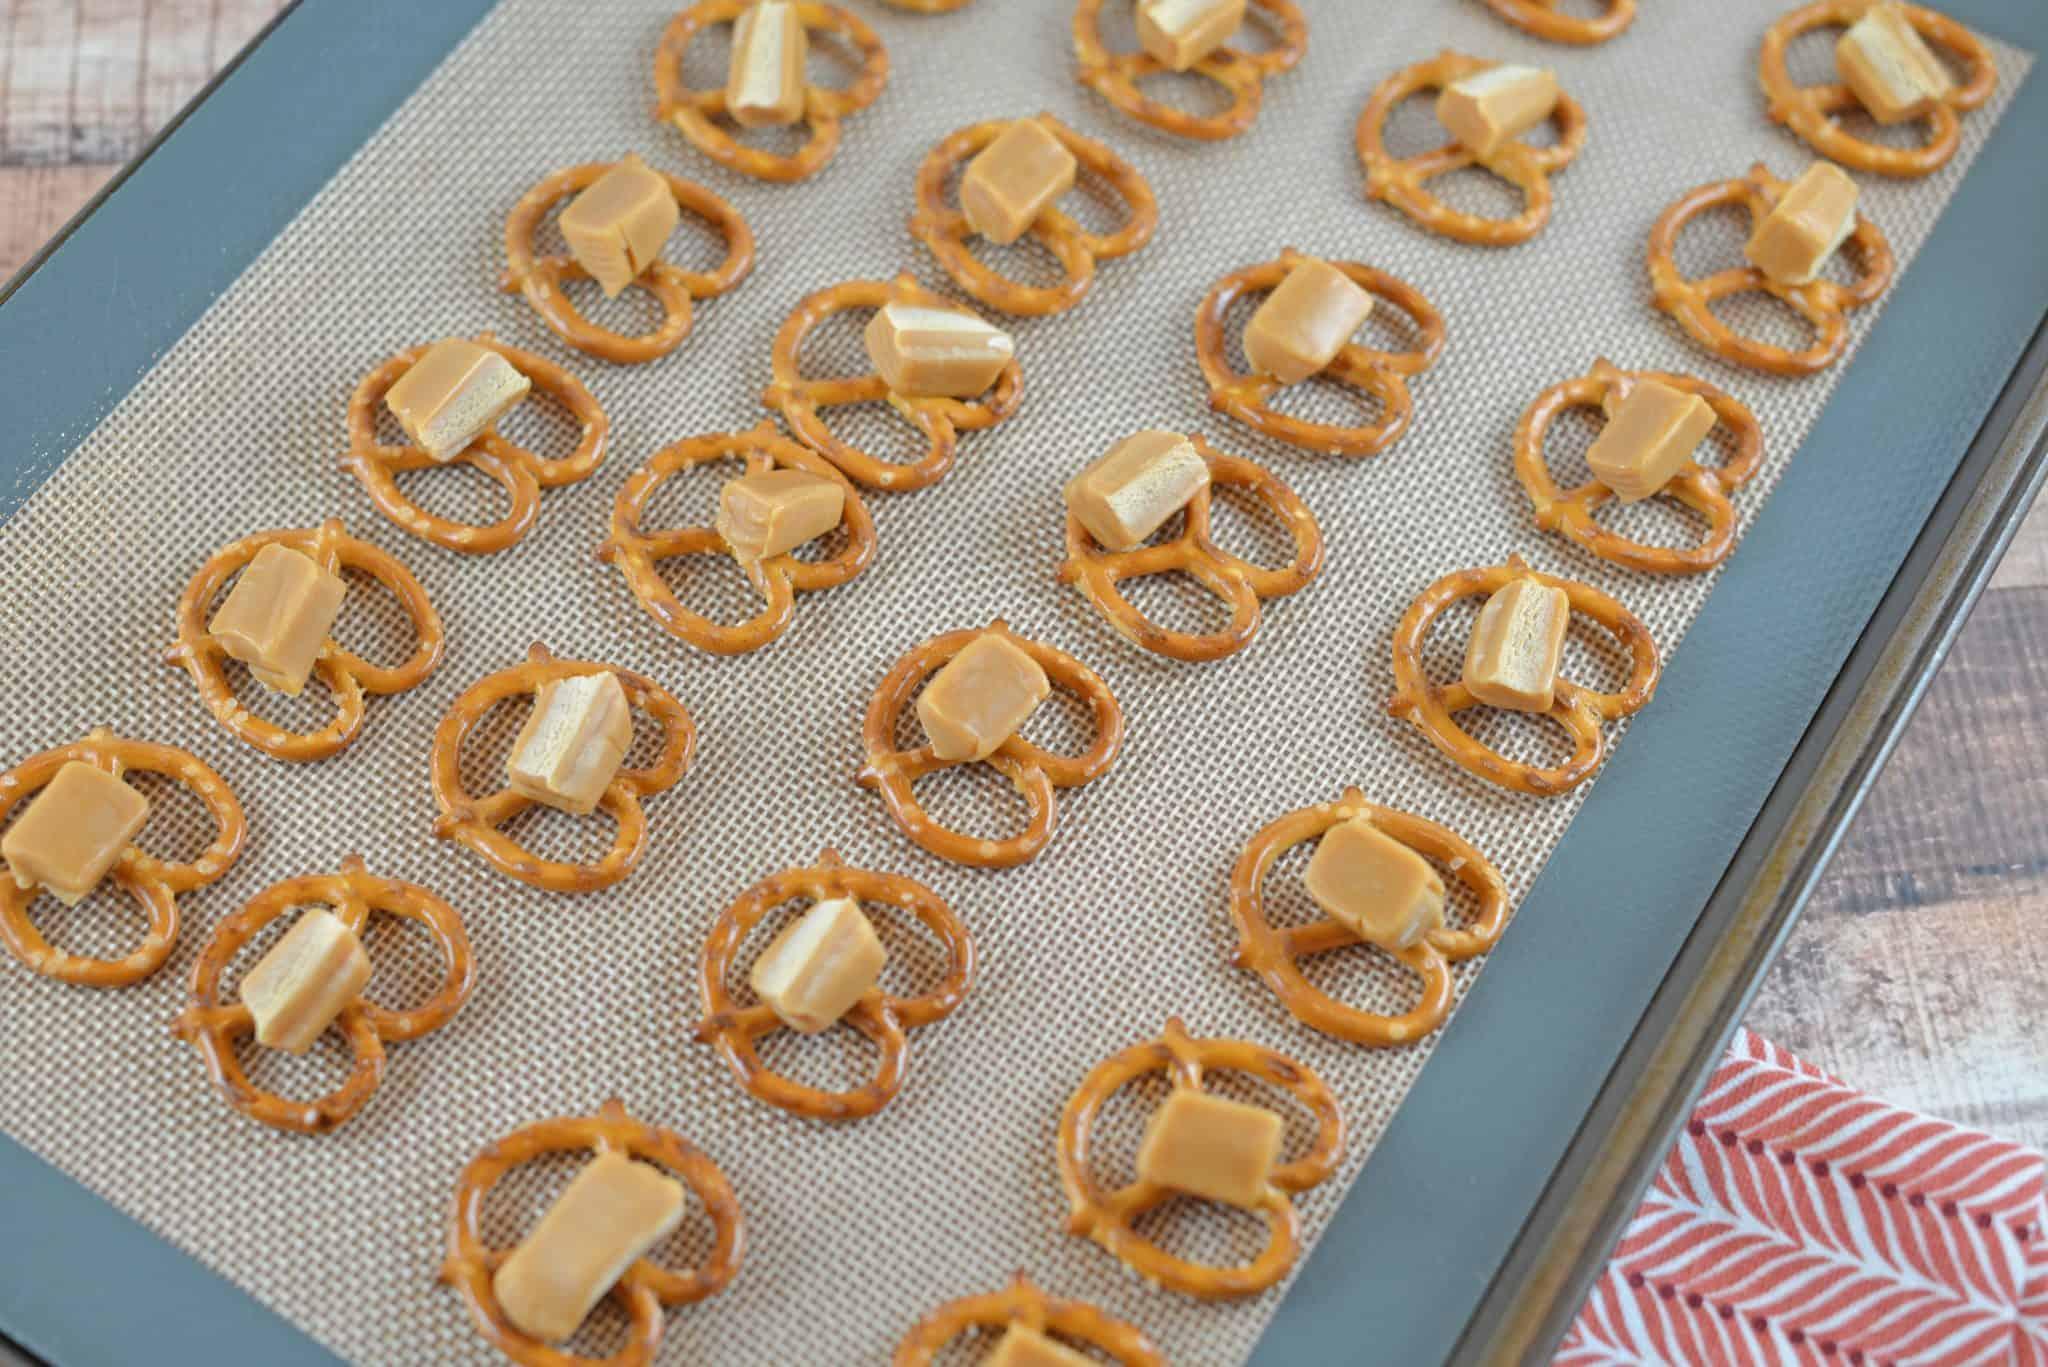 A close up of pretzels with caramel pieces